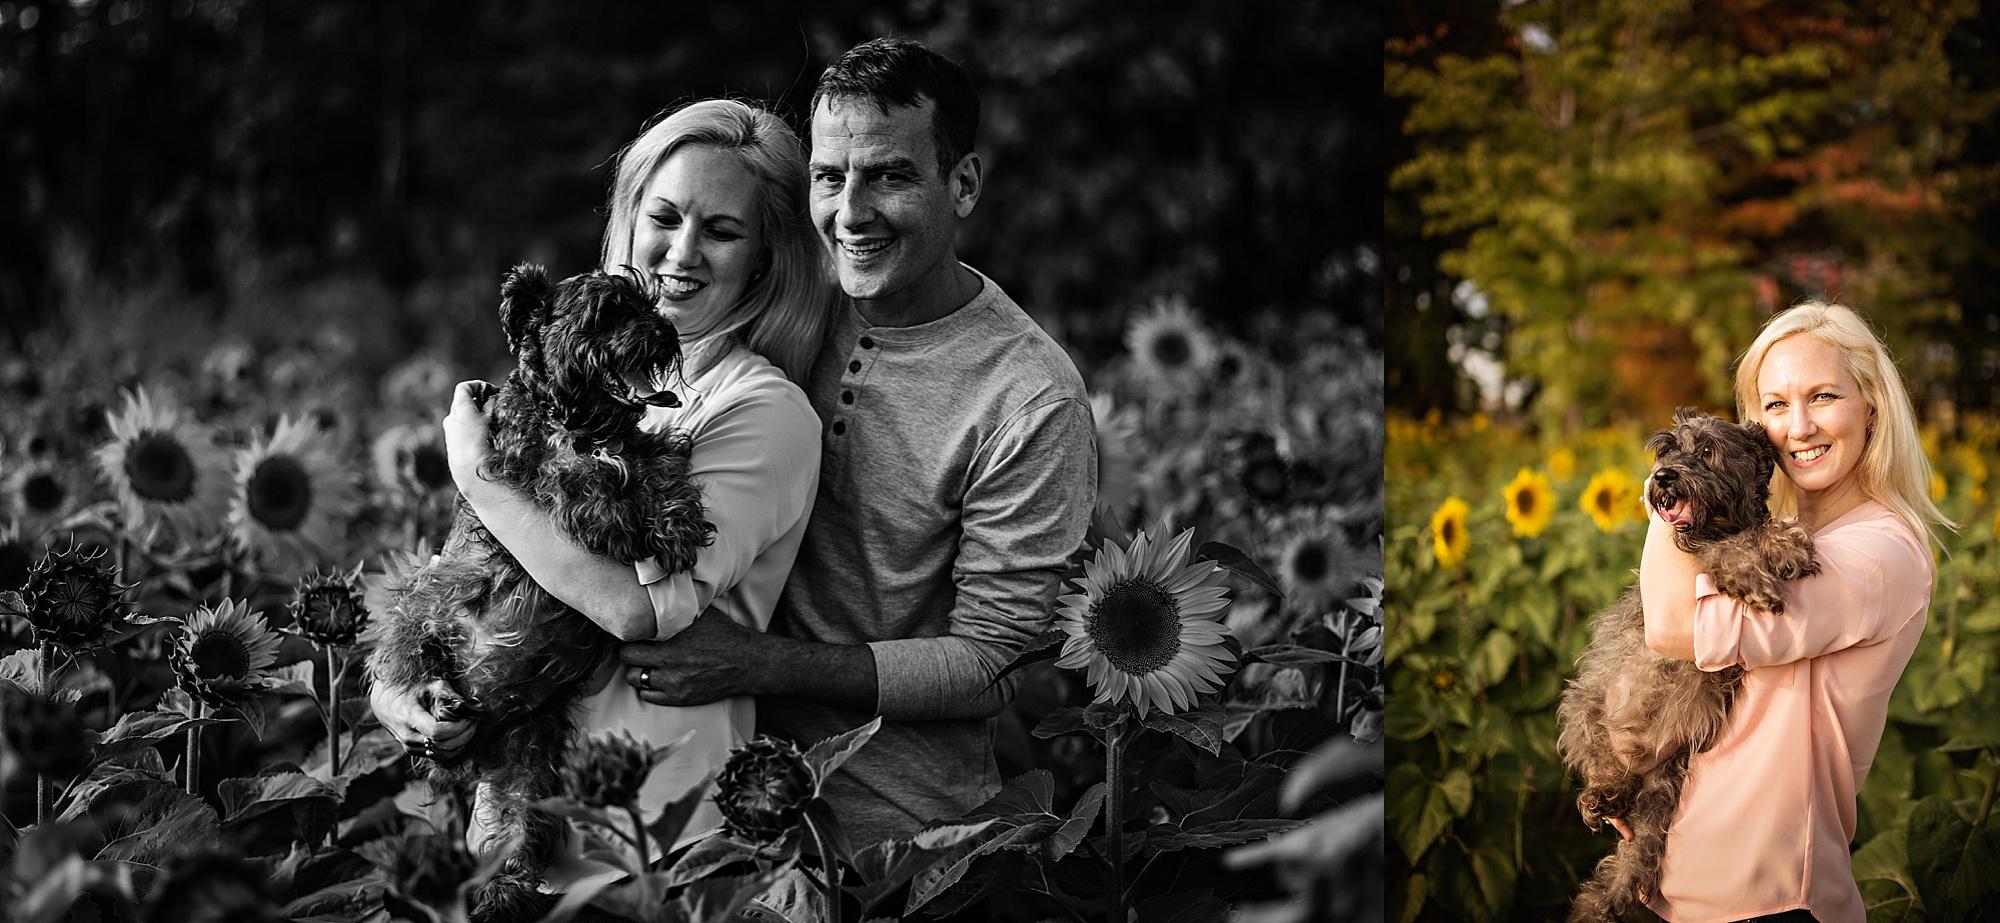 Lori-and-mike-akron-ohio-photographer-lauren-grayson-sunflower-field-session_0027.jpg